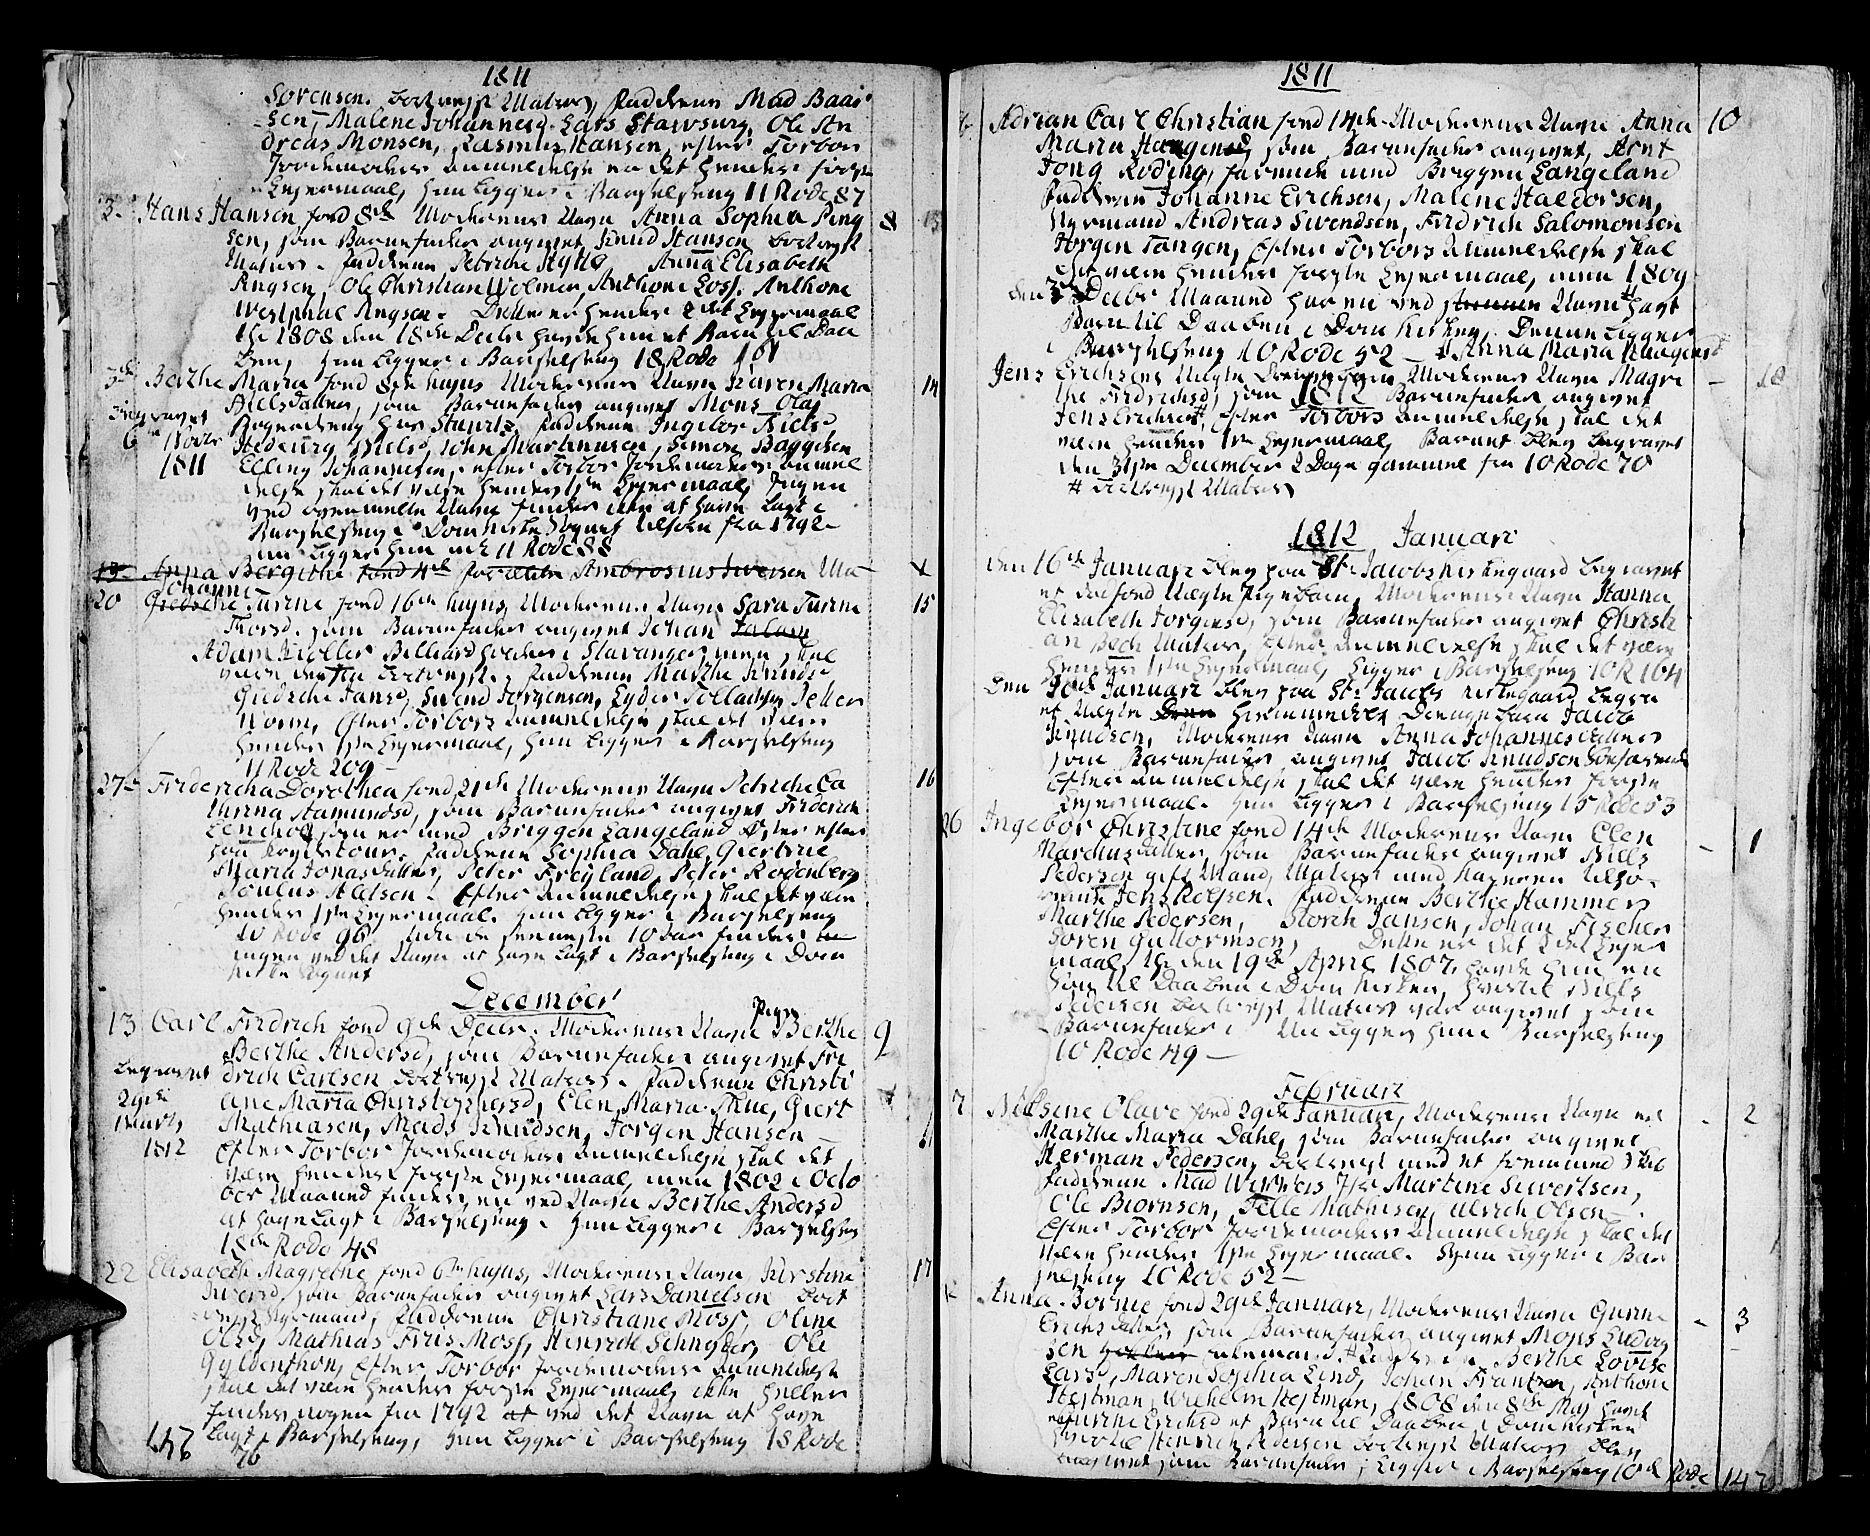 SAB, Domkirken Sokneprestembete, H/Haa/L0005: Ministerialbok nr. A 5, 1808-1820, s. 246-247